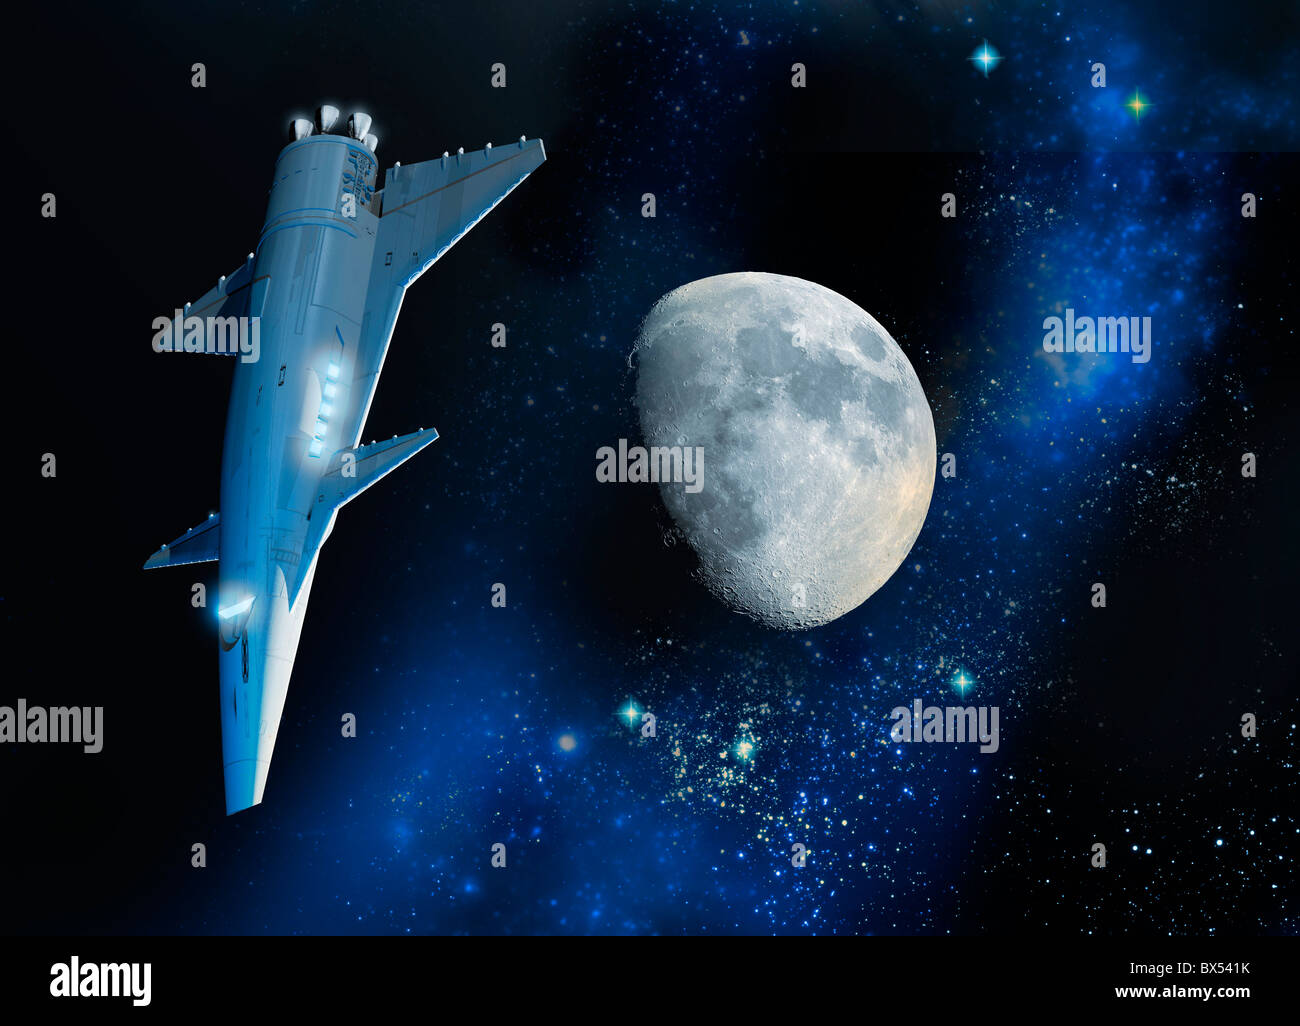 Spaceship, artwork - Stock Image